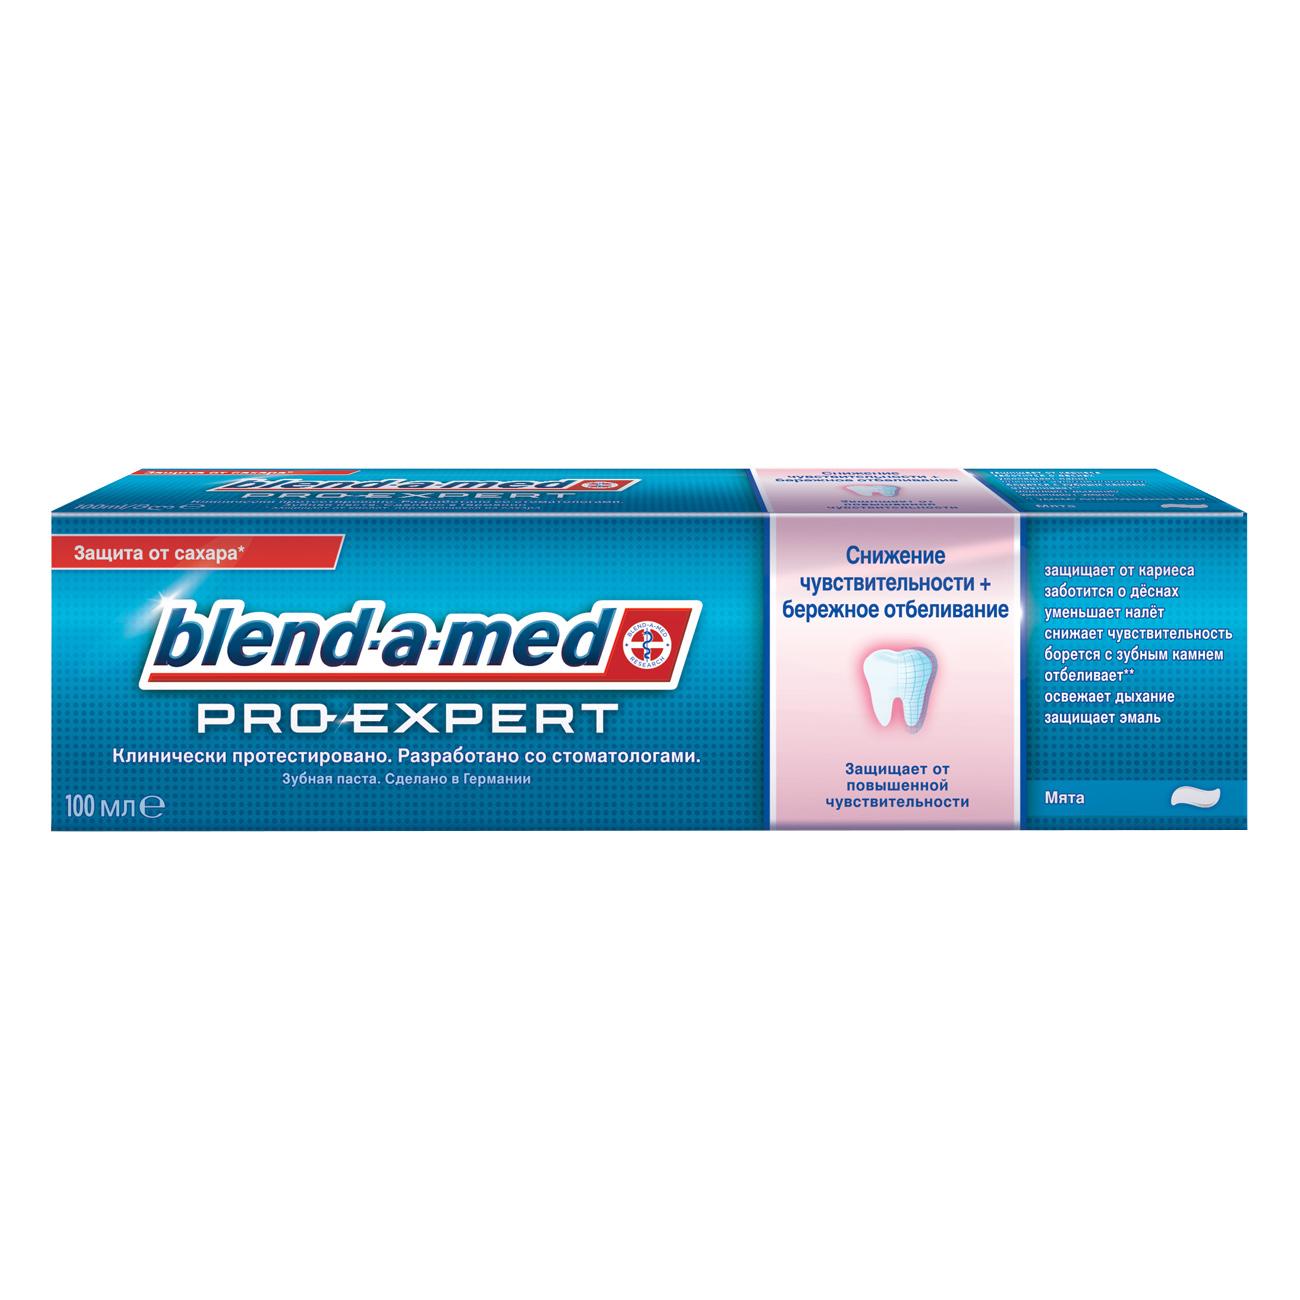 Зубная паста Blend-a-med ProExpert Снижение чувствительности Мята 100мл